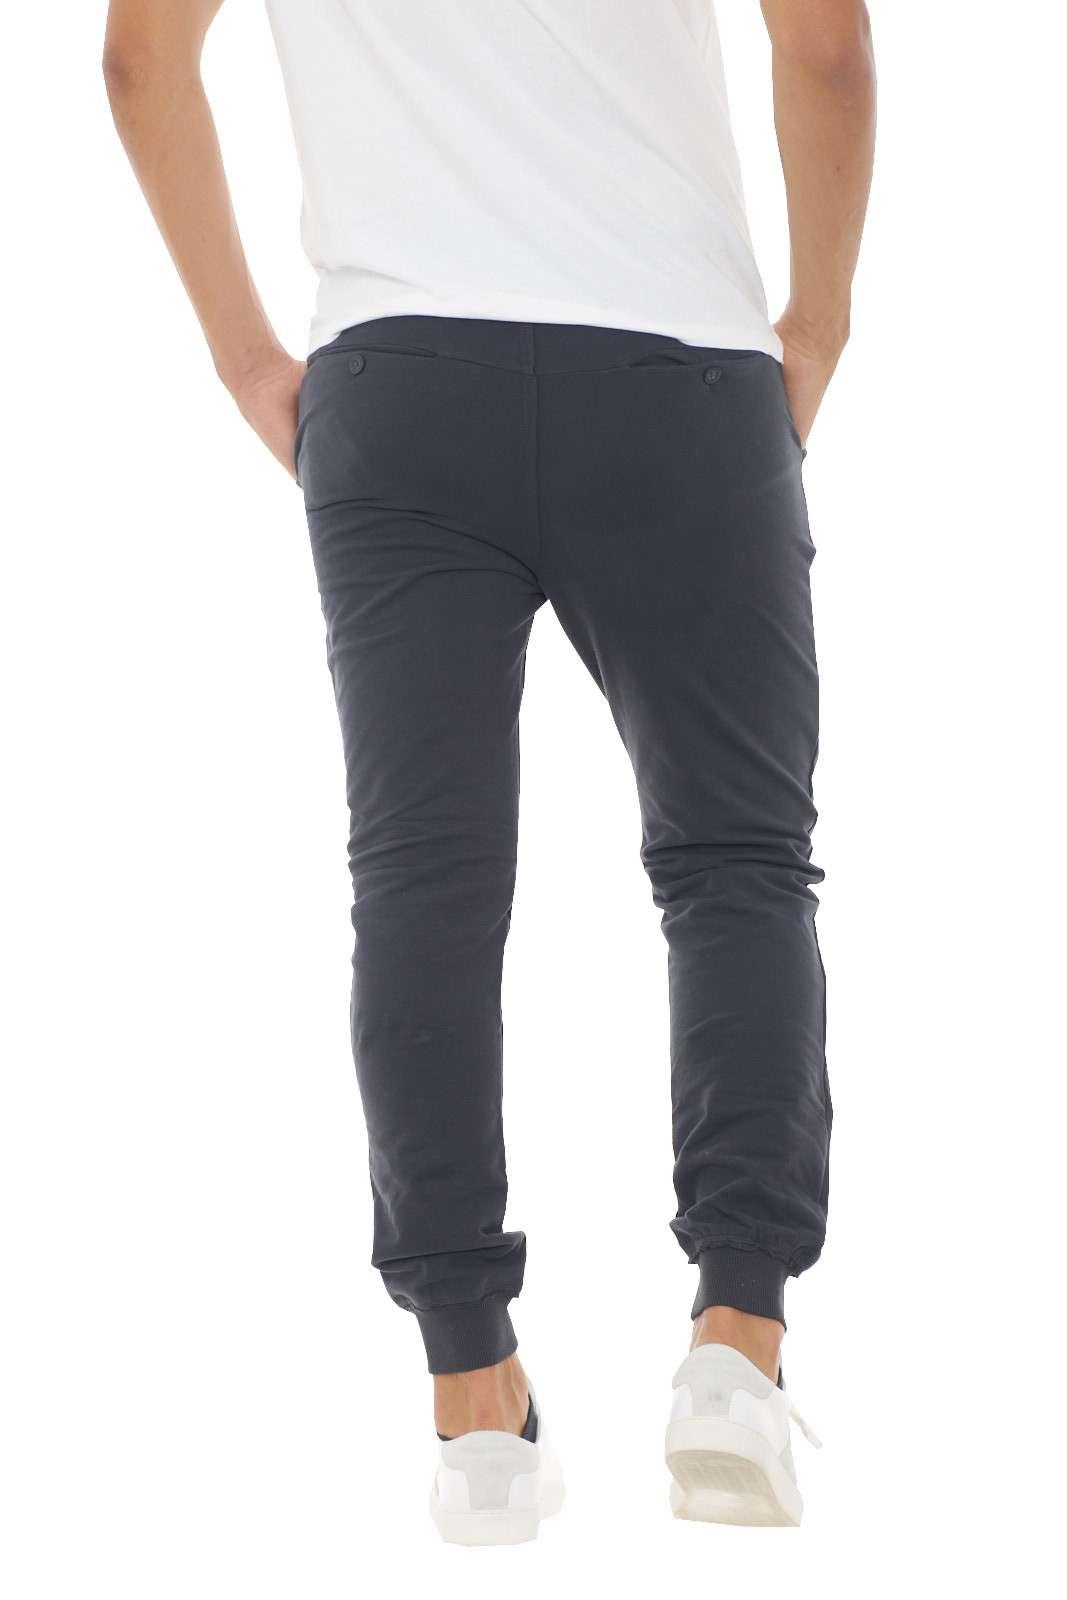 https://www.parmax.com/media/catalog/product/a/i/AI-outlet_parmax-pantaloni-uomo-Us-Polo-43300-C.jpg